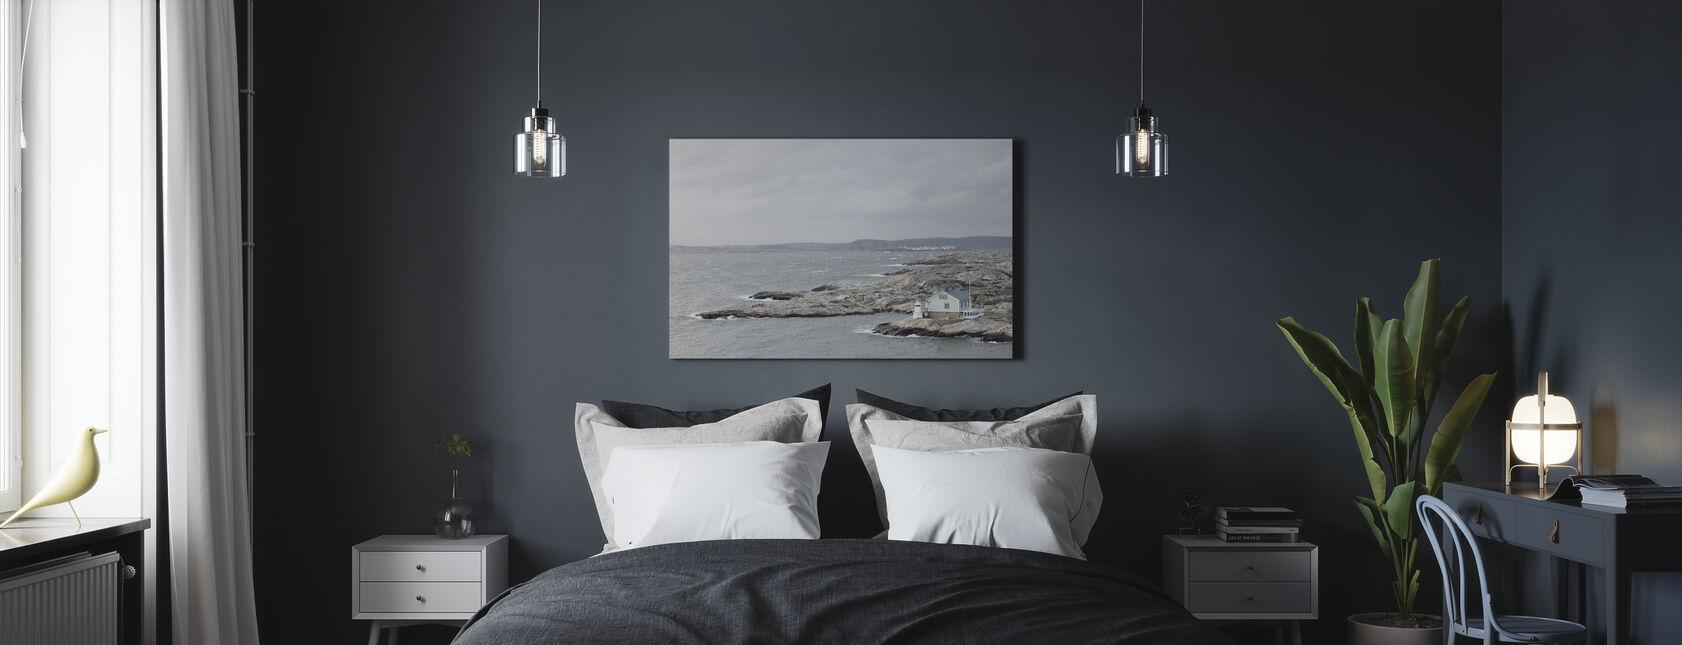 Majakka Bohuslan, Ruotsi - Canvastaulu - Makuuhuone